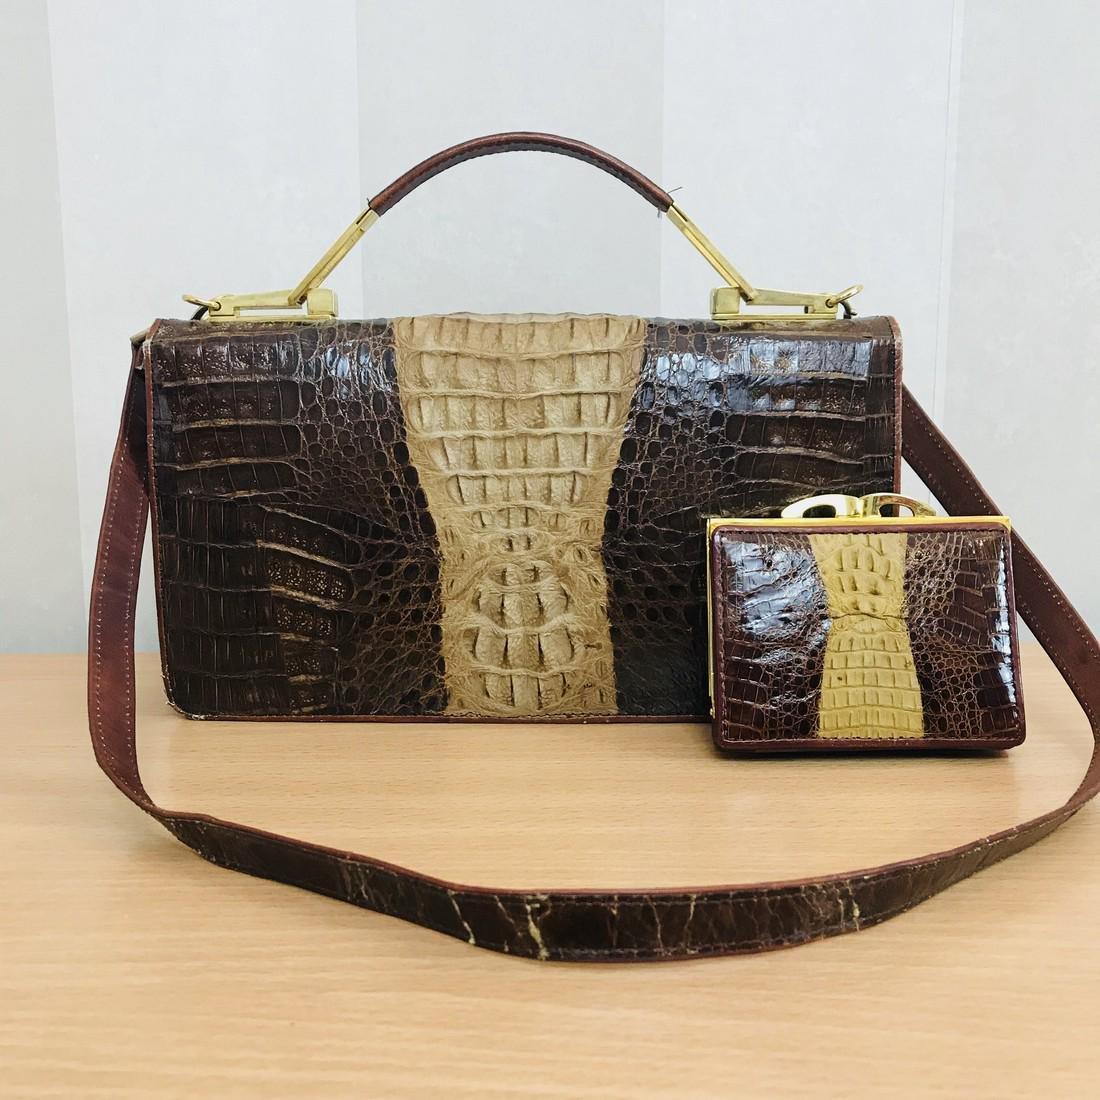 Vintage Genuine Crocodile Leather Handbag with Small